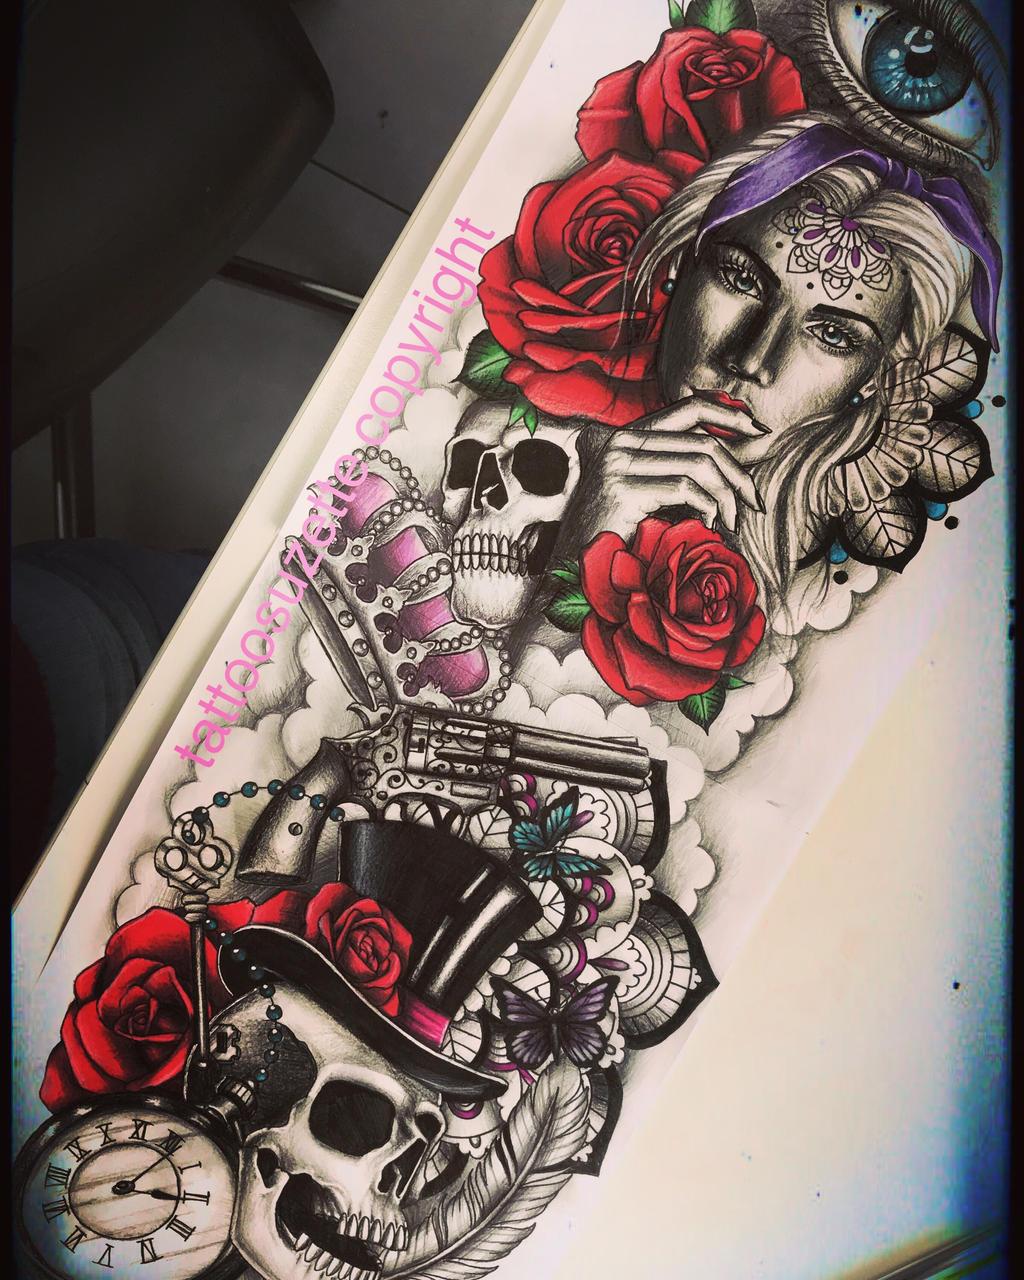 Tatouage Bras Complet Rose Tete De Mort By Tattoosuzette On